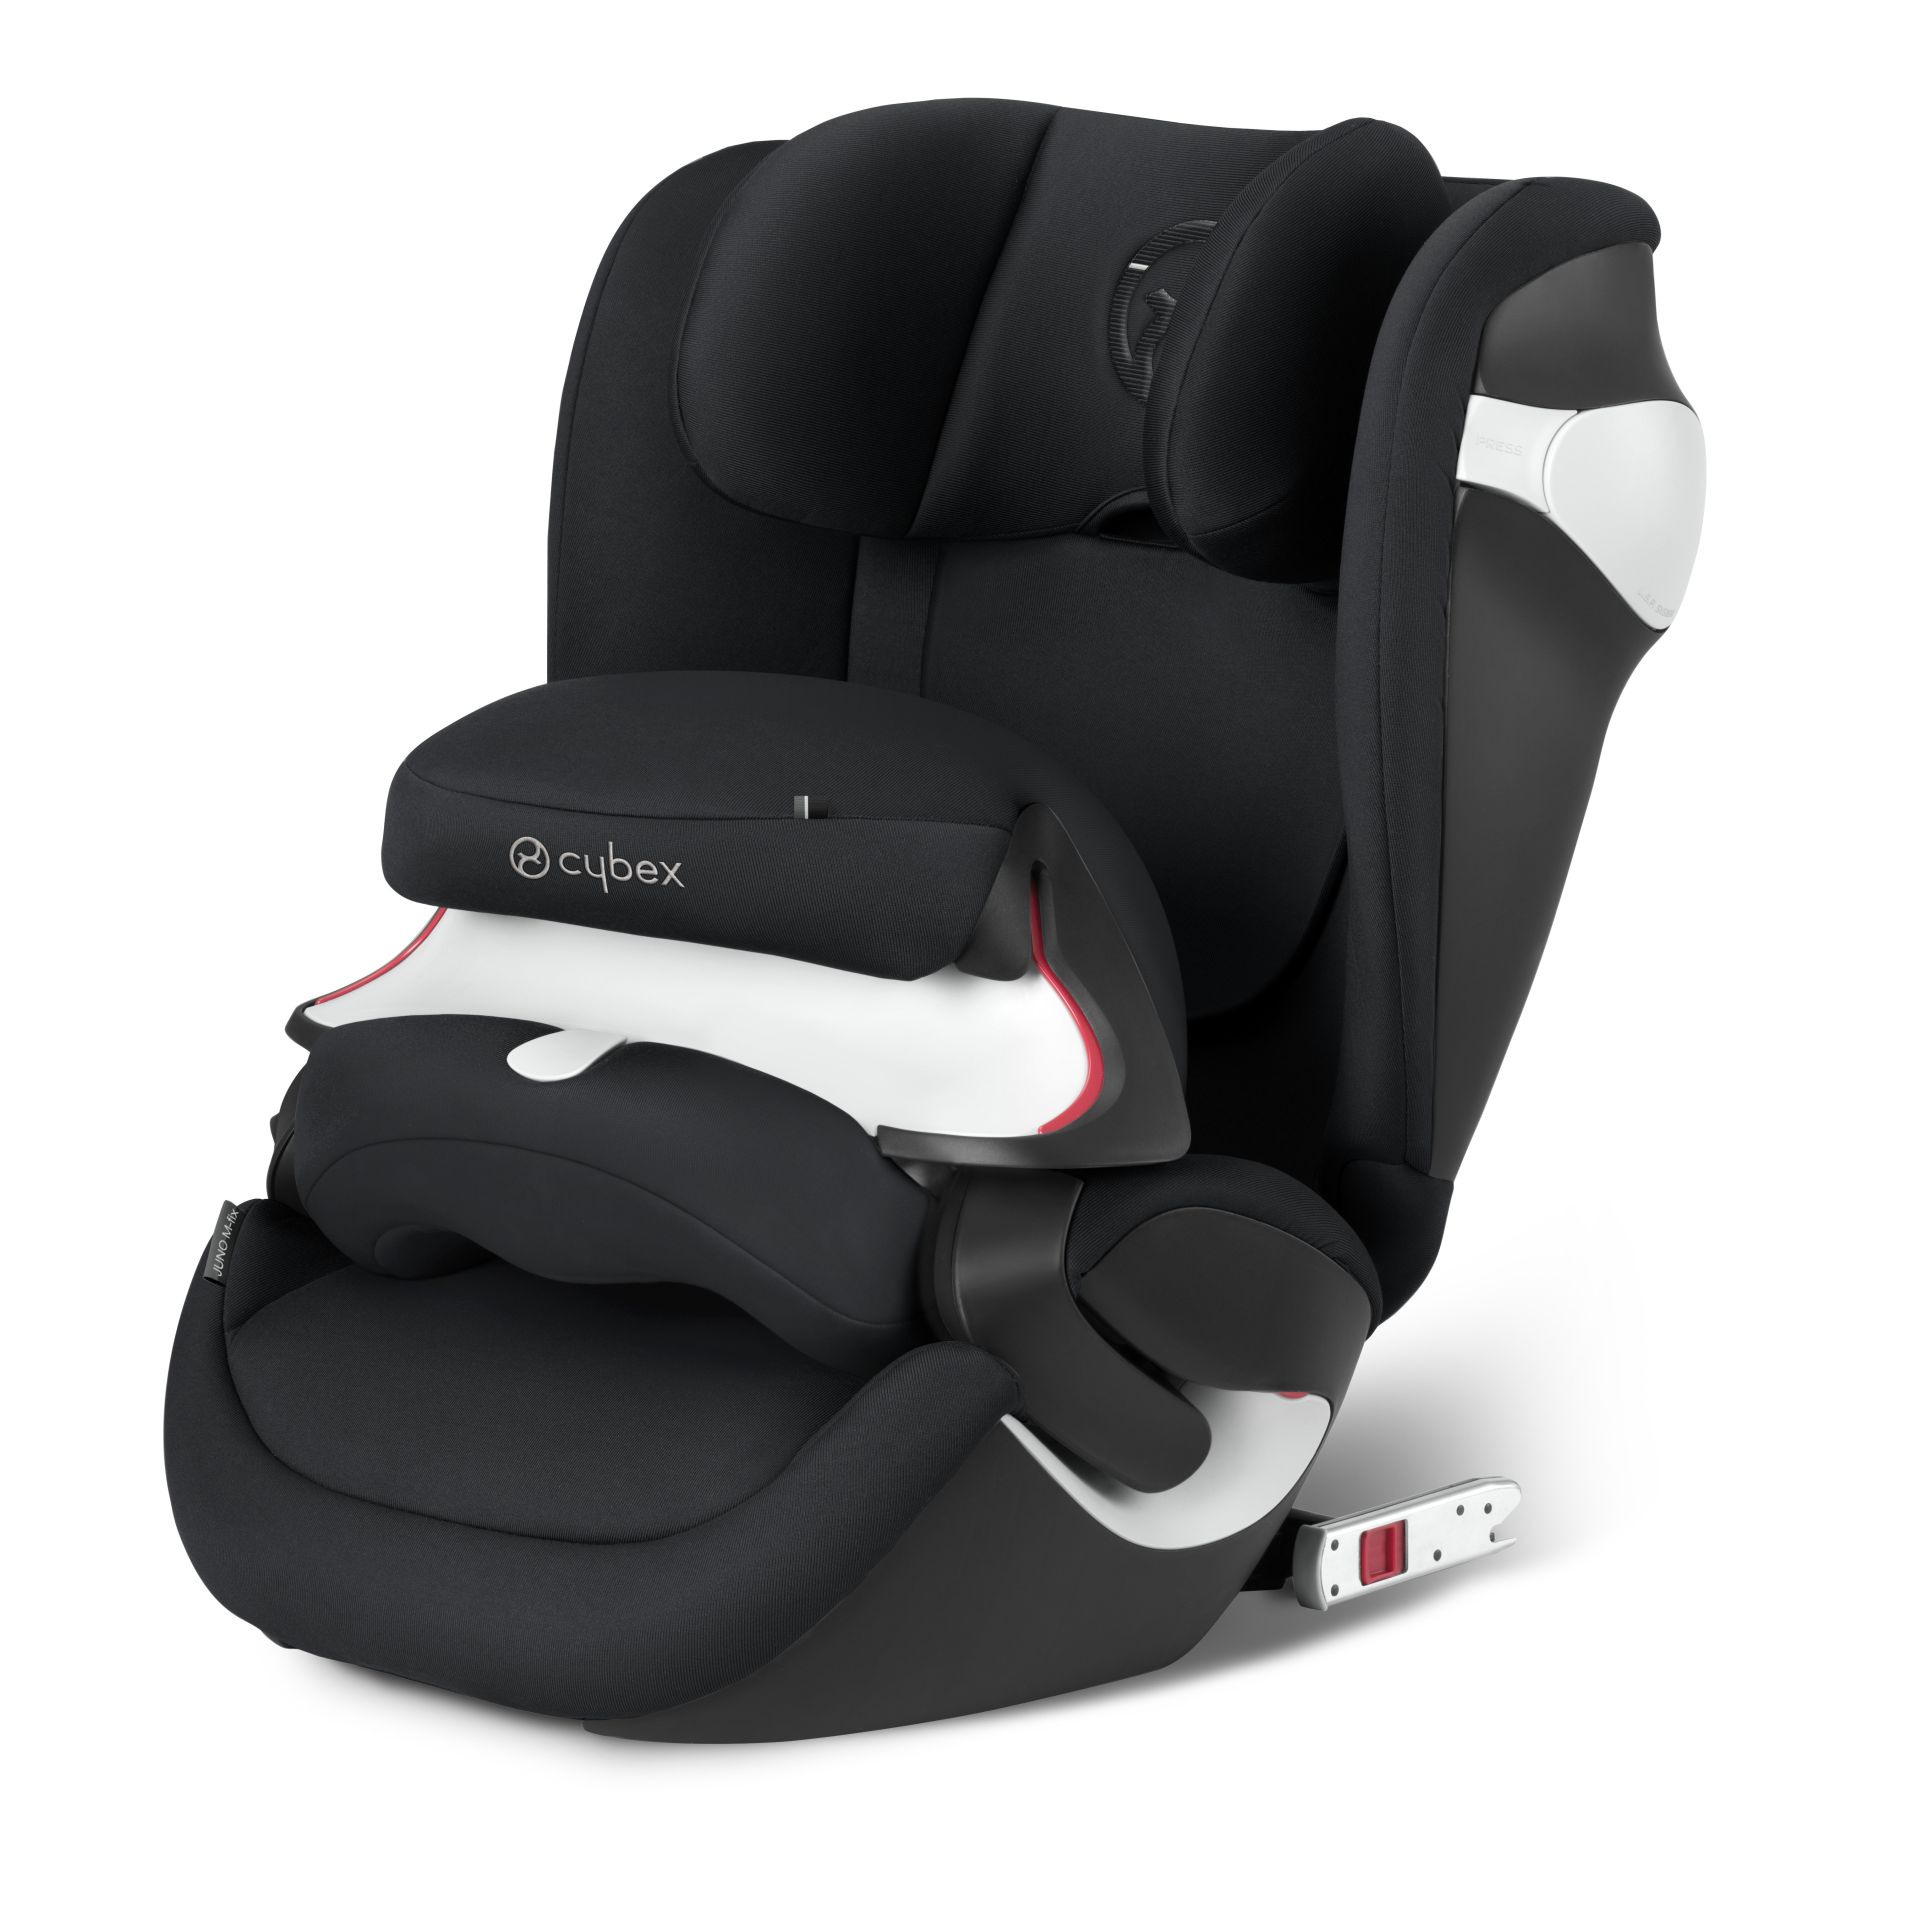 cybex car seat juno m fix 2017 stardust black black. Black Bedroom Furniture Sets. Home Design Ideas